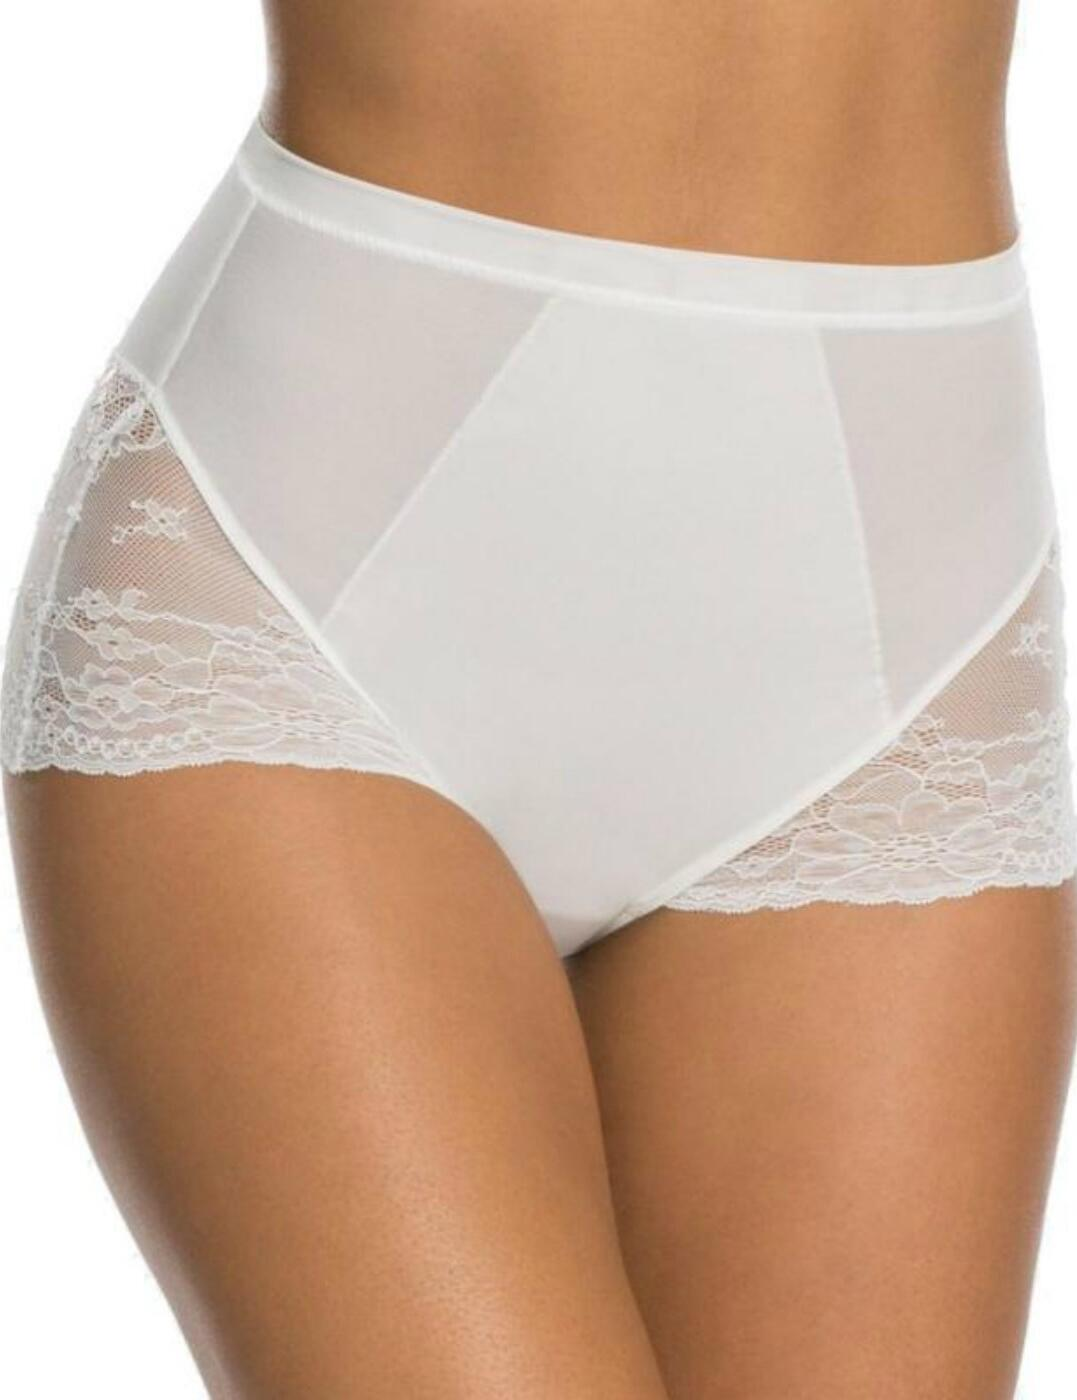 10123R Spanx Spotlight On Lace Brief - 10123R Clean White